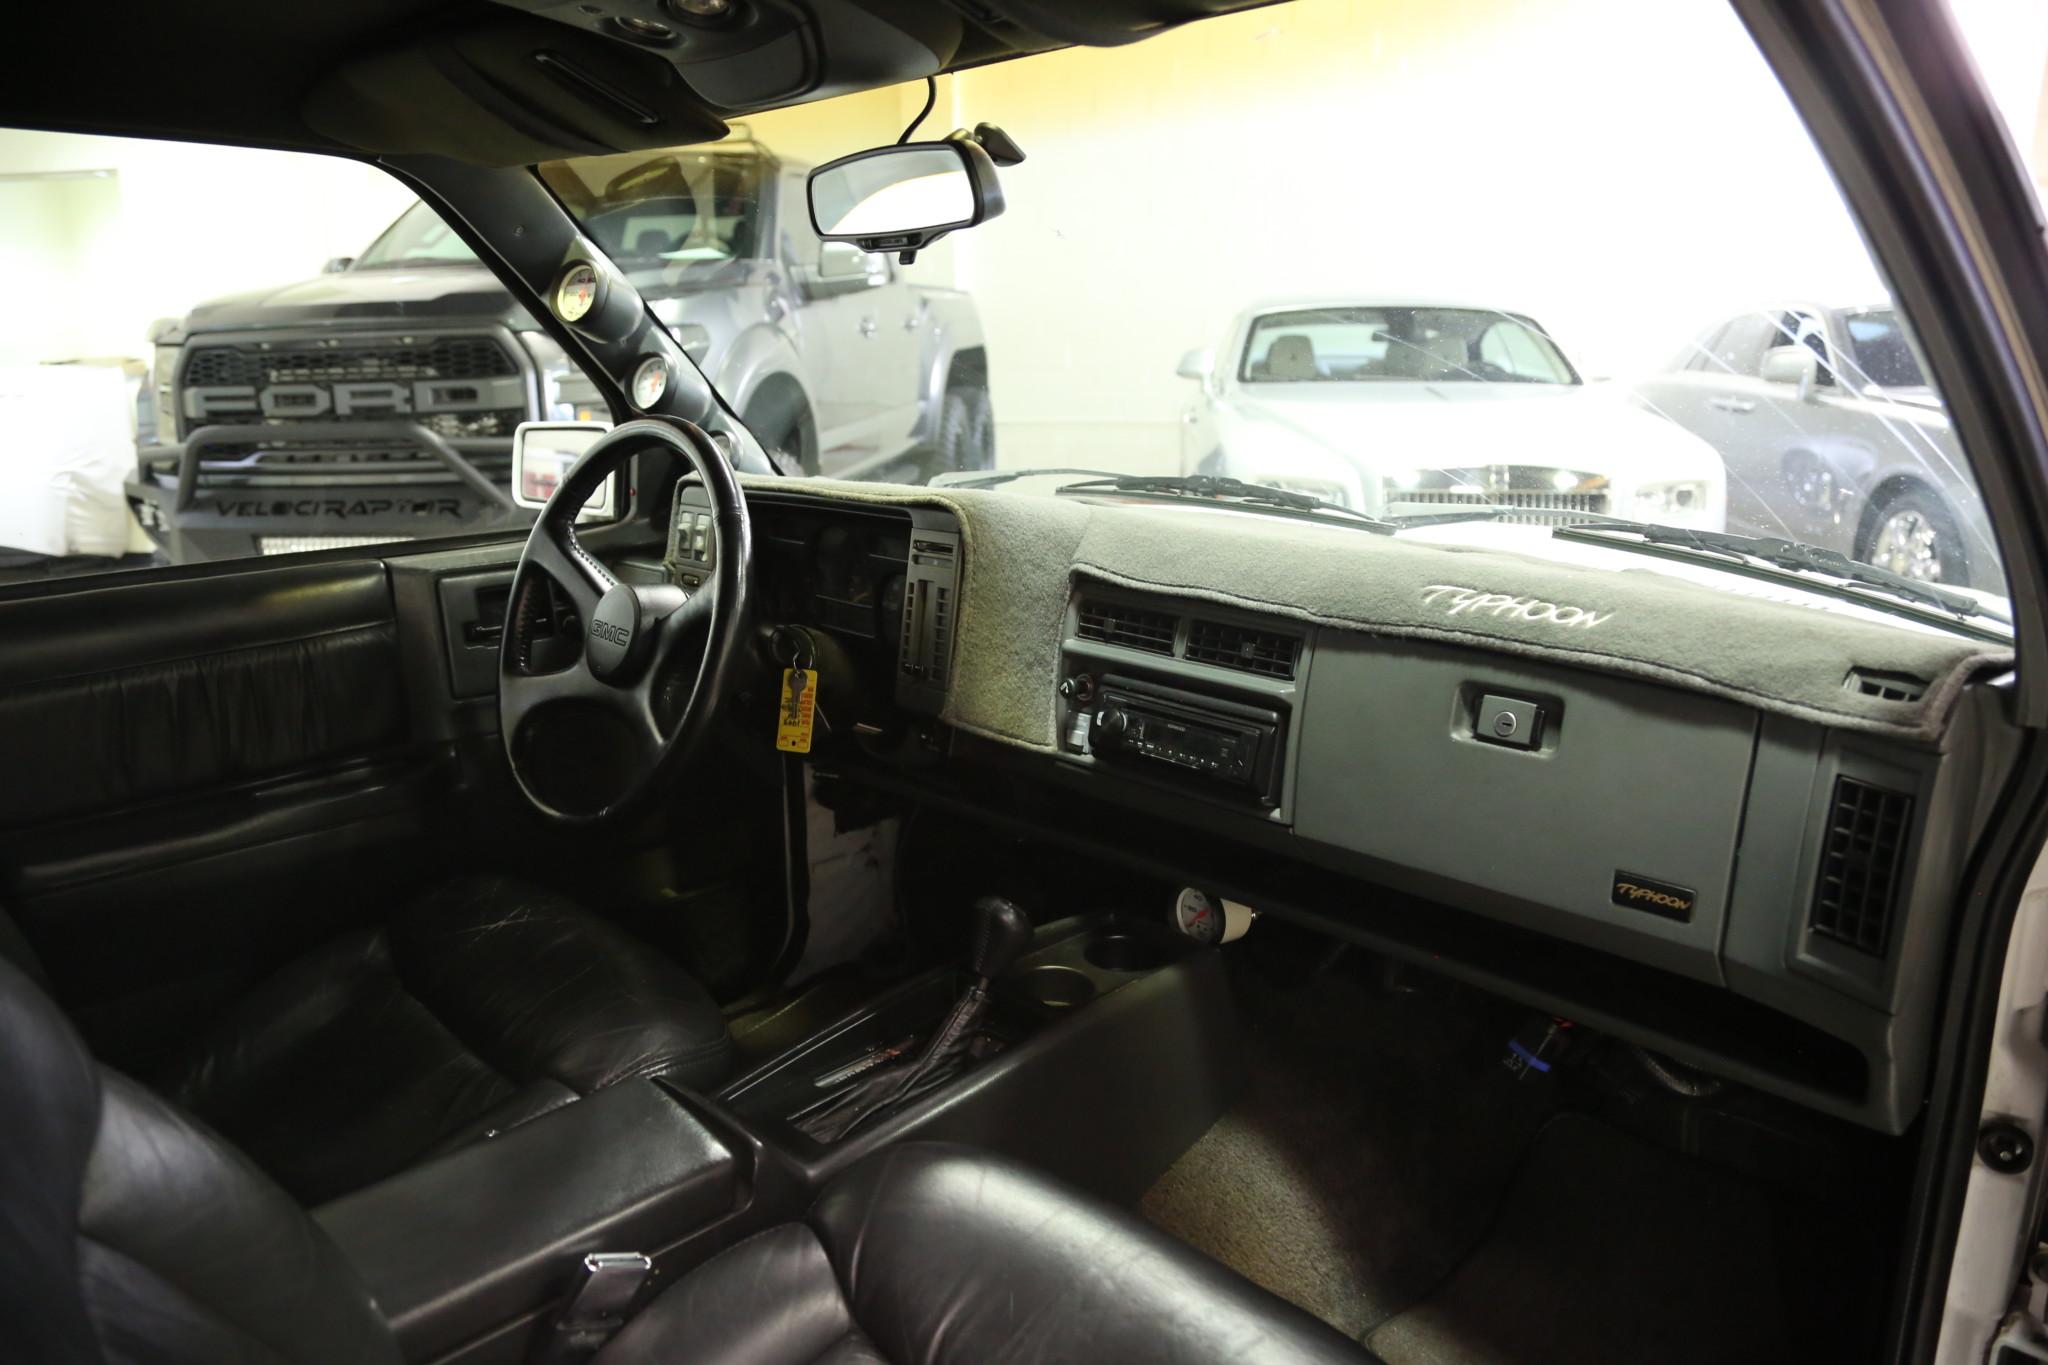 1993 GMC Typhoon passenger interior